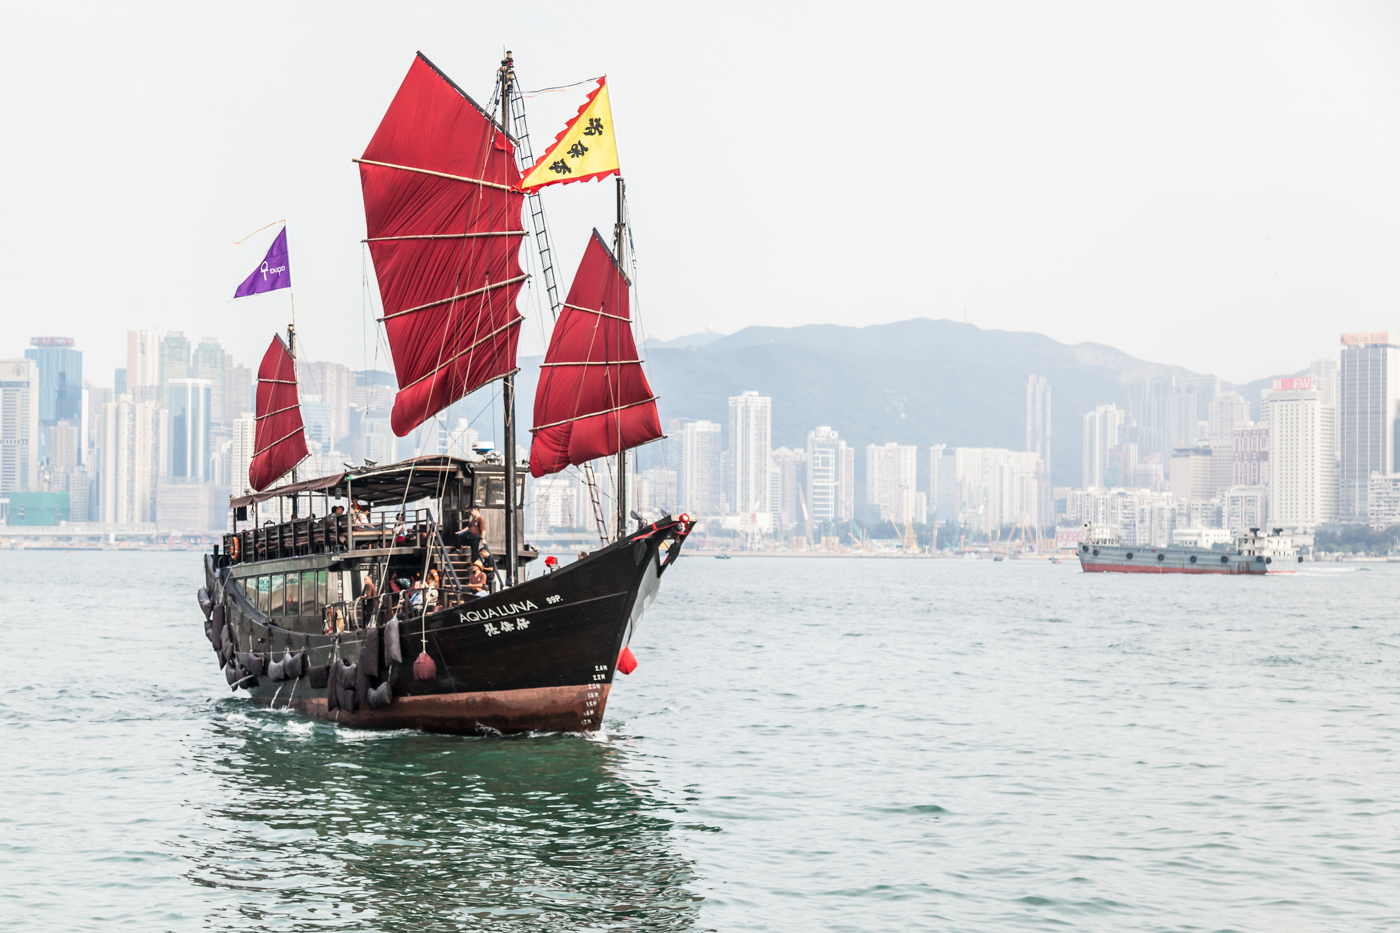 Aqua Luna - a red sail Chinese junk boat sailing through Hong Kong's Victoria Harbour.